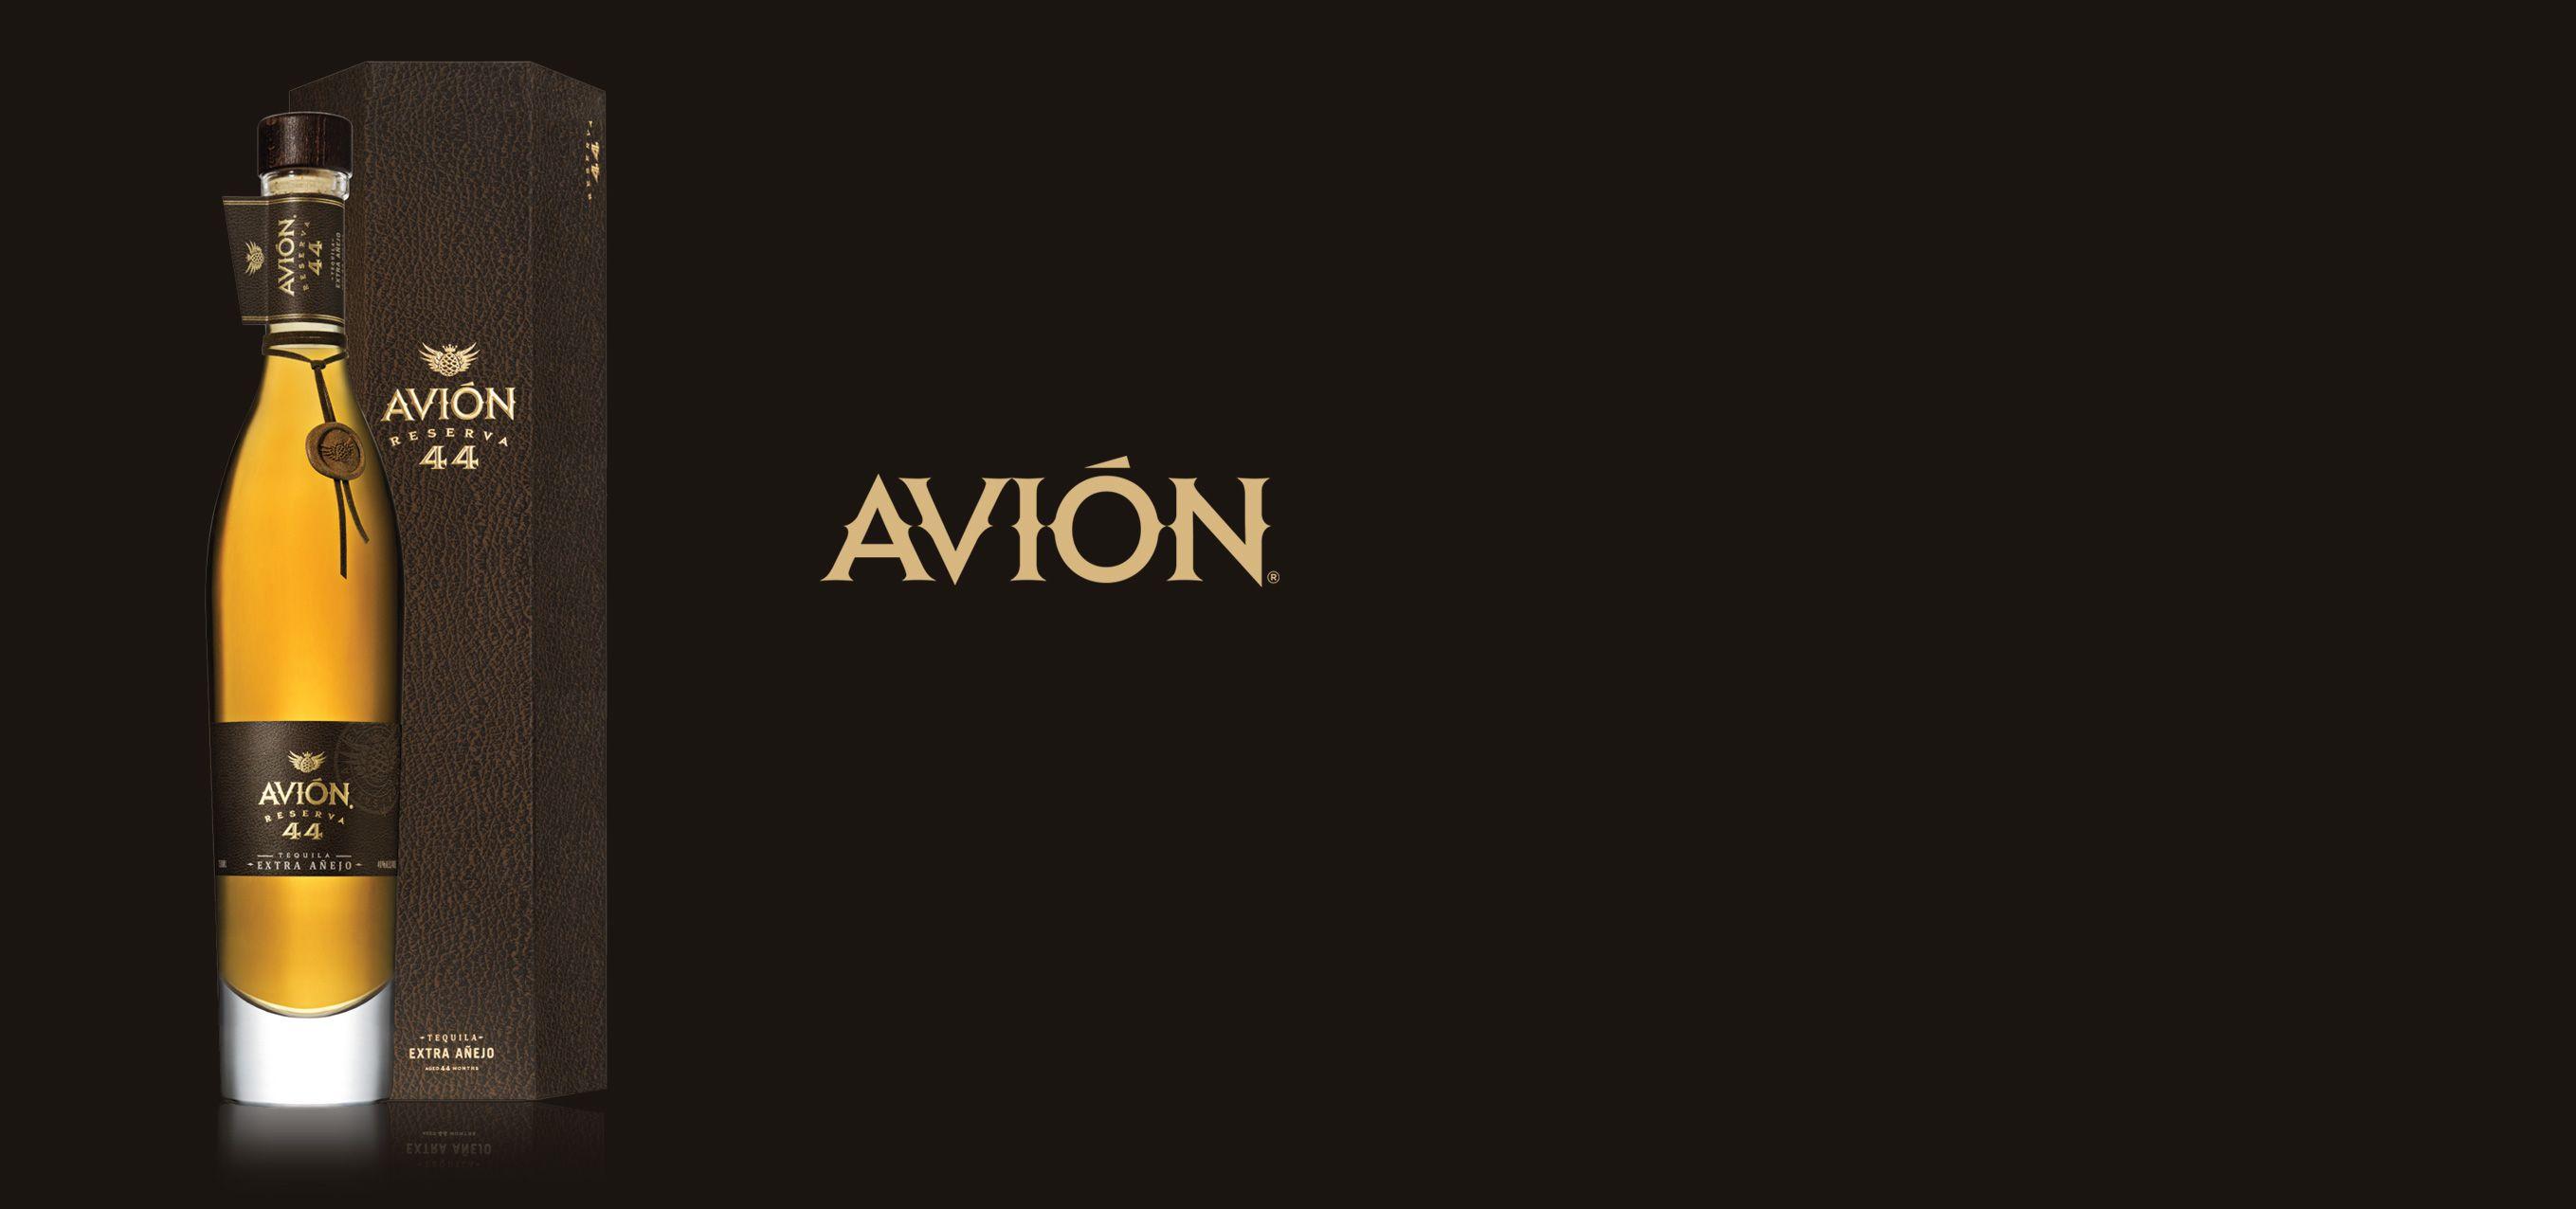 Buy Avion Reserva 44 Extra Anejo Tequila Reservebar